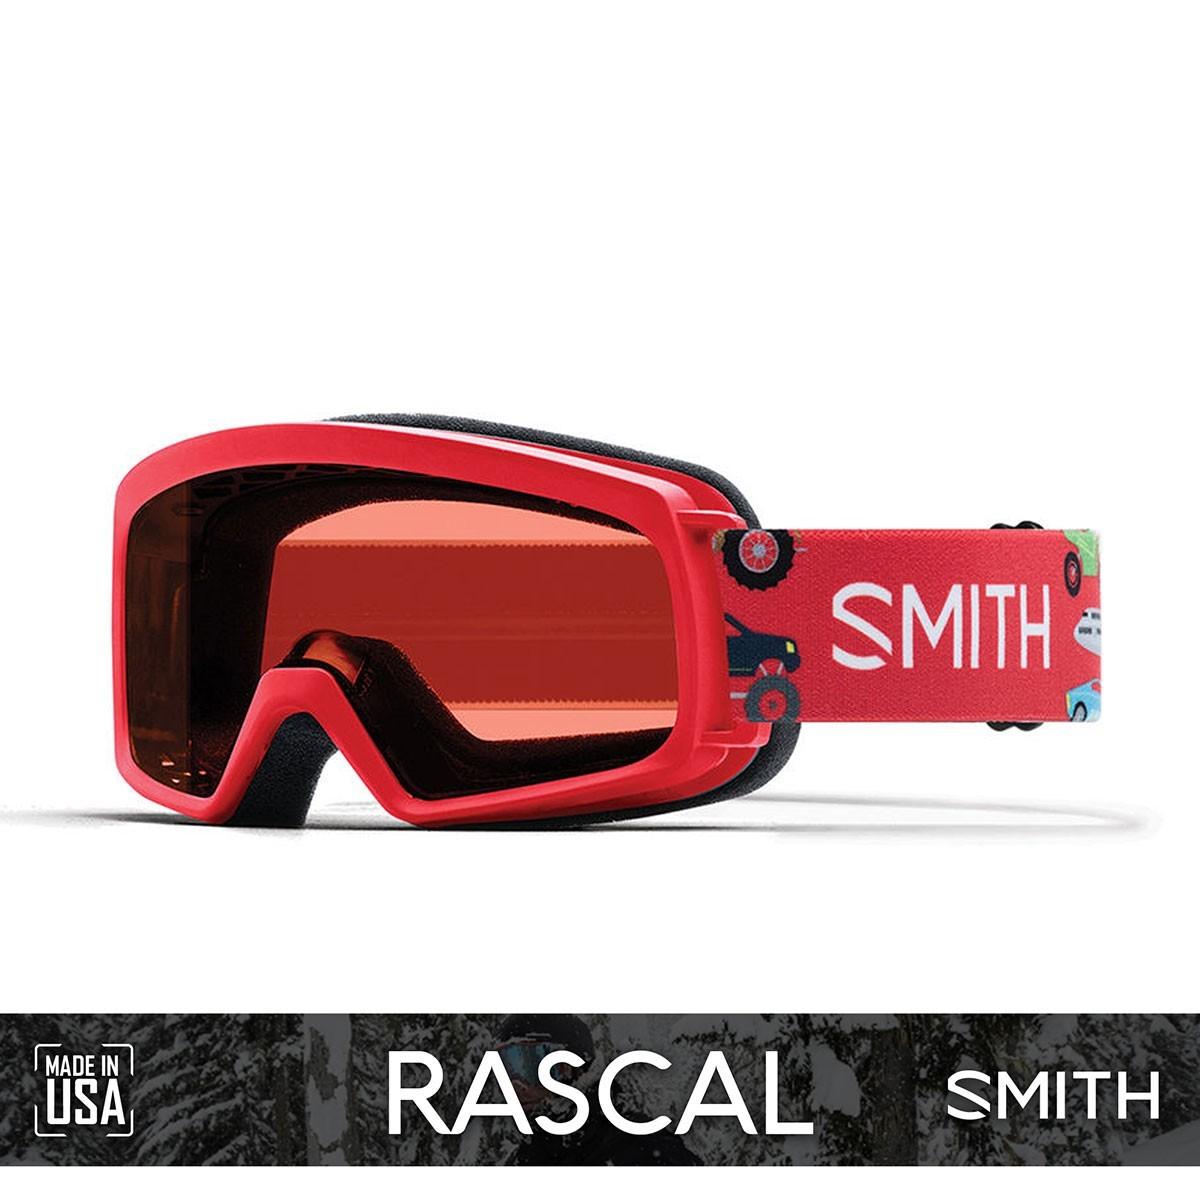 SMITH RASCAL Fire Transportation | S2 RC36 ROSEC - Изображение - AQUAMATRIX